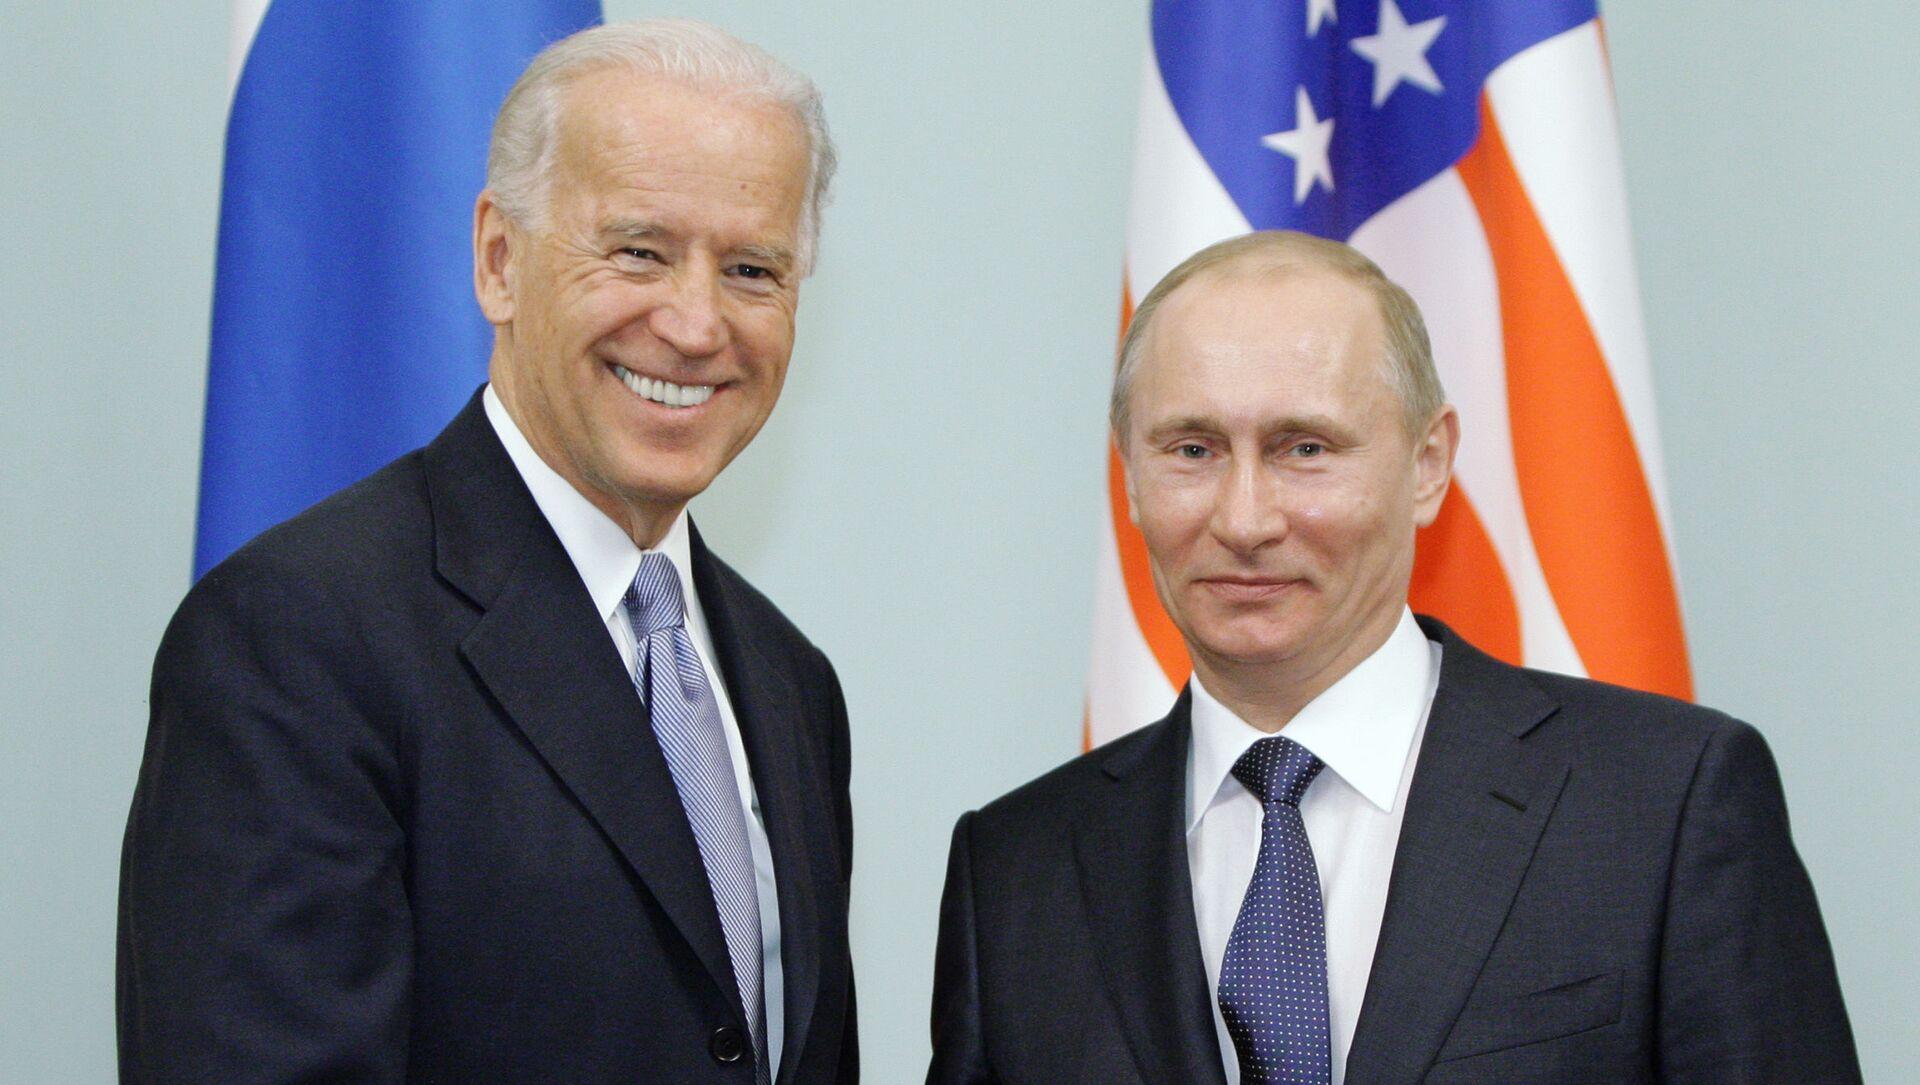 Joe Biden y Vladímir Putin (archivo) - Sputnik Mundo, 1920, 10.11.2020